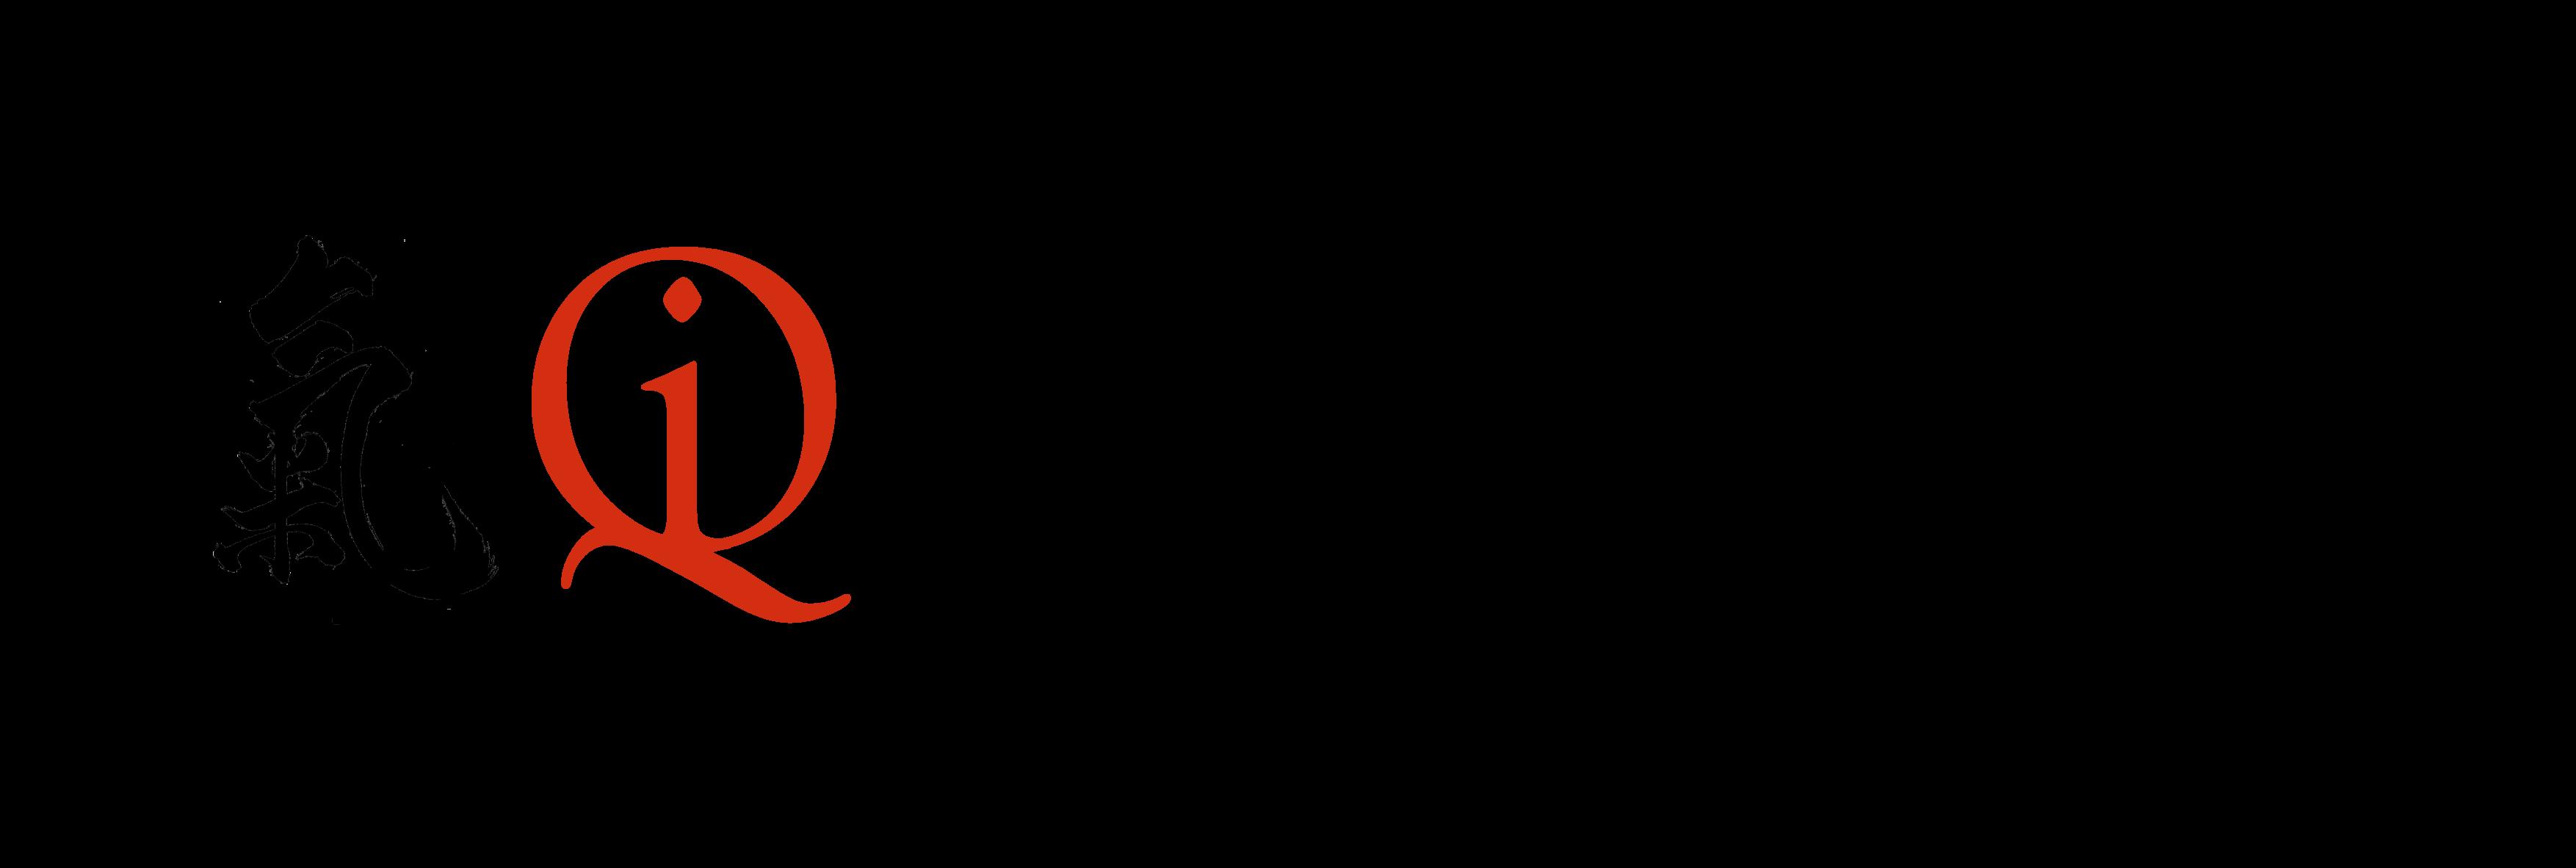 logo Qidynamic